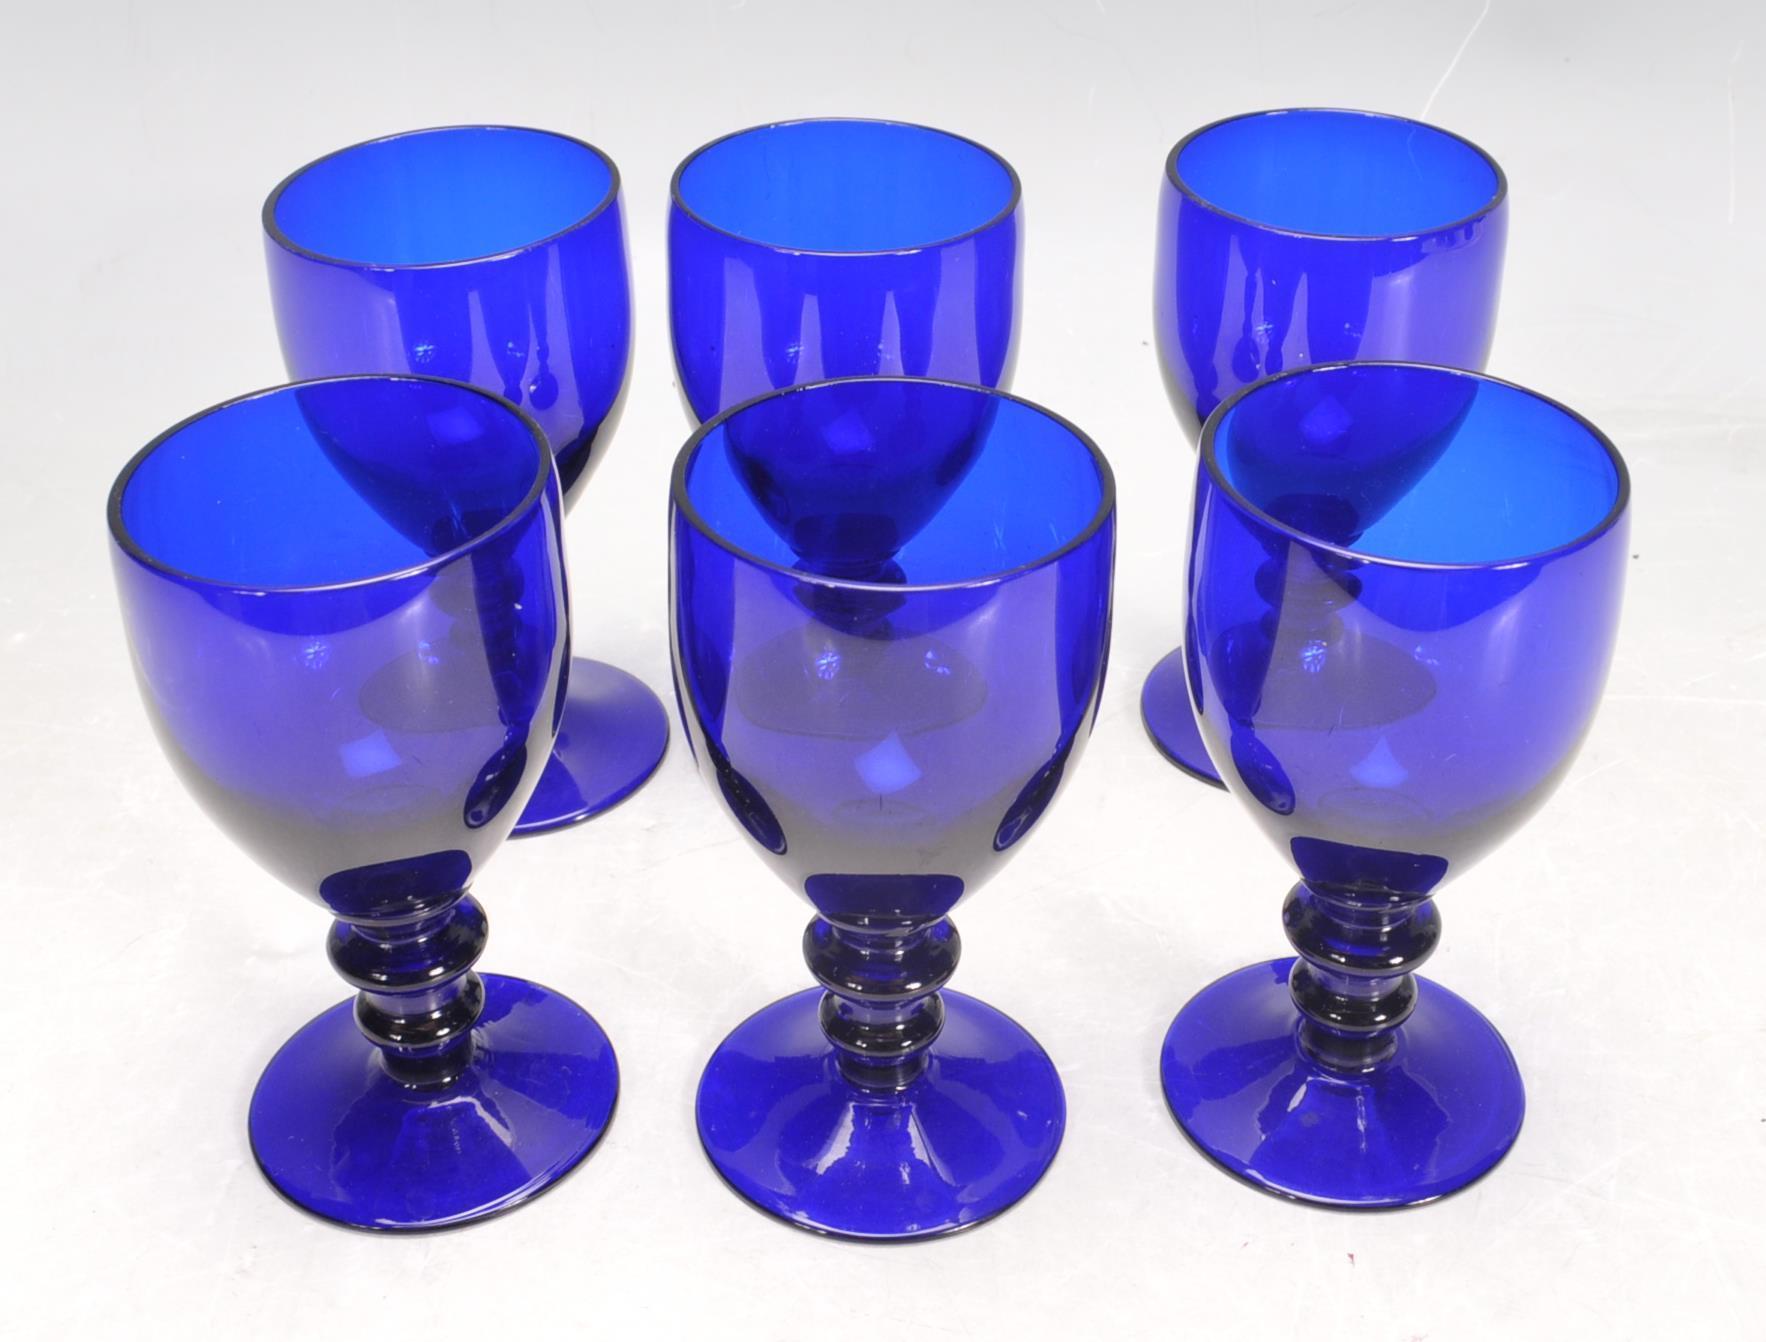 BRISTOL BLUE GLASS ORNAMENTS - Image 4 of 34